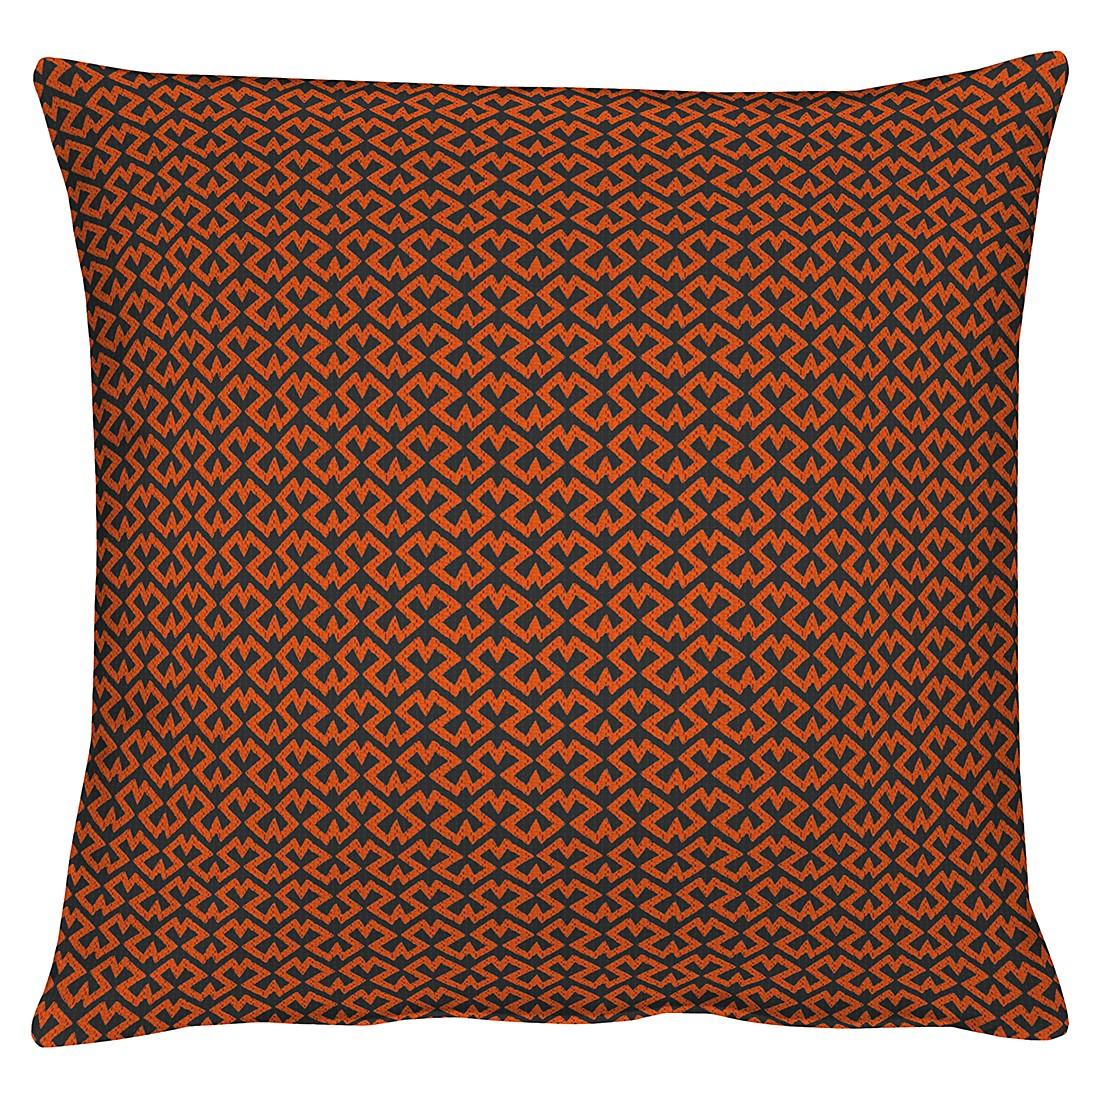 Kissenhülle Pizzo – Orange – 40 x 40 cm, Apelt günstig kaufen